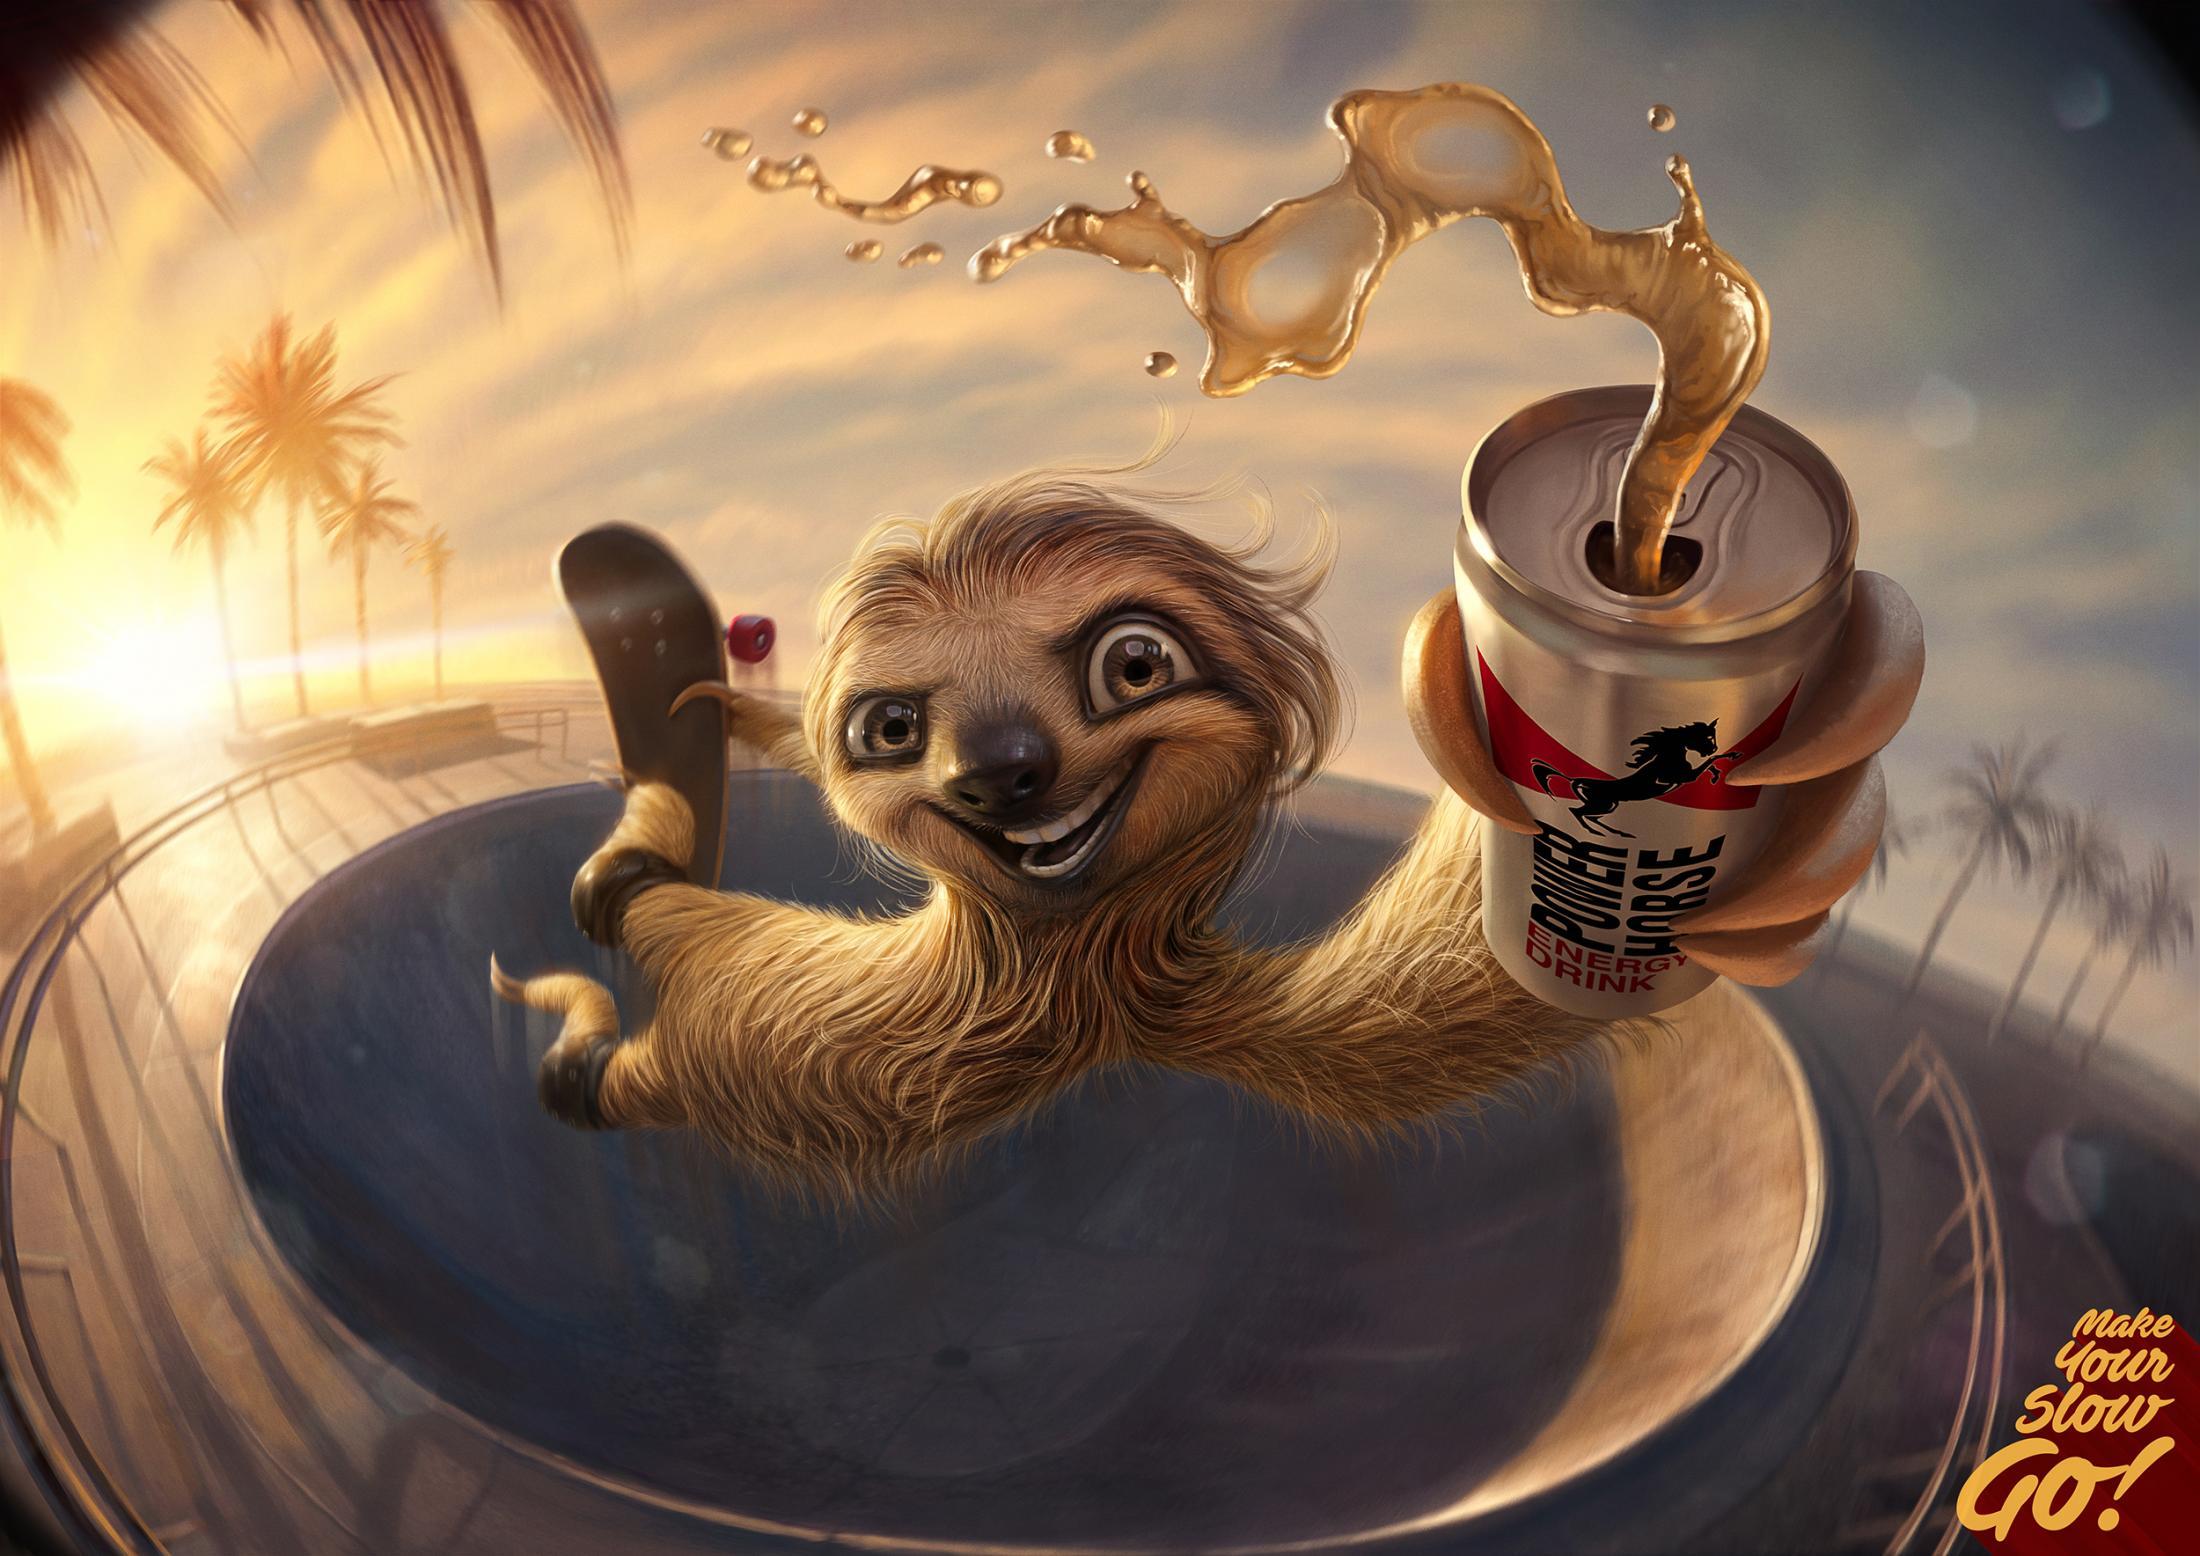 26.Power Horse Sloth.[大嘴收纳屋].jpg